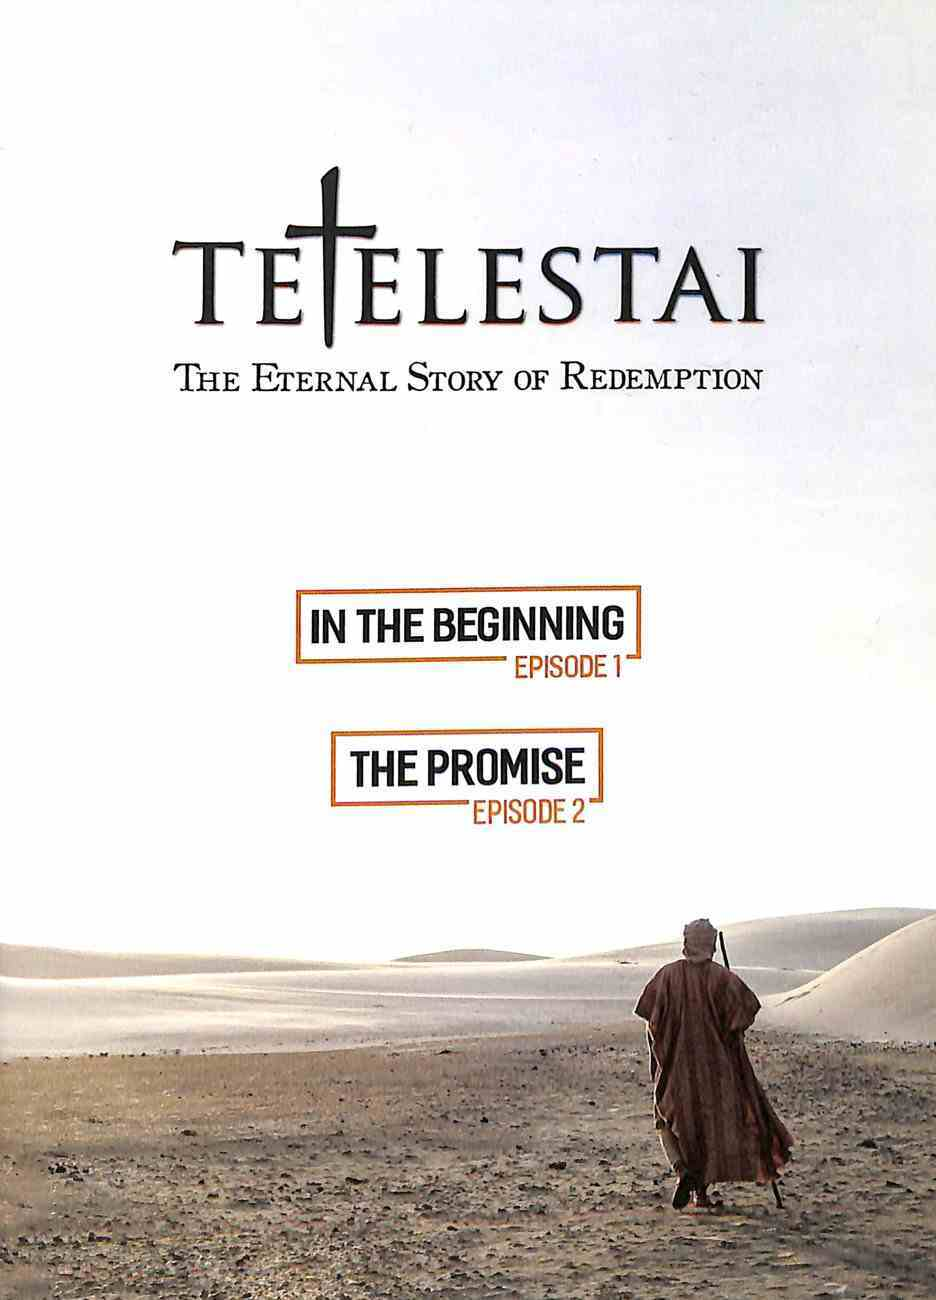 Tetelestai Episodes 1 & 2 (In The Beginning & The Promise) DVD